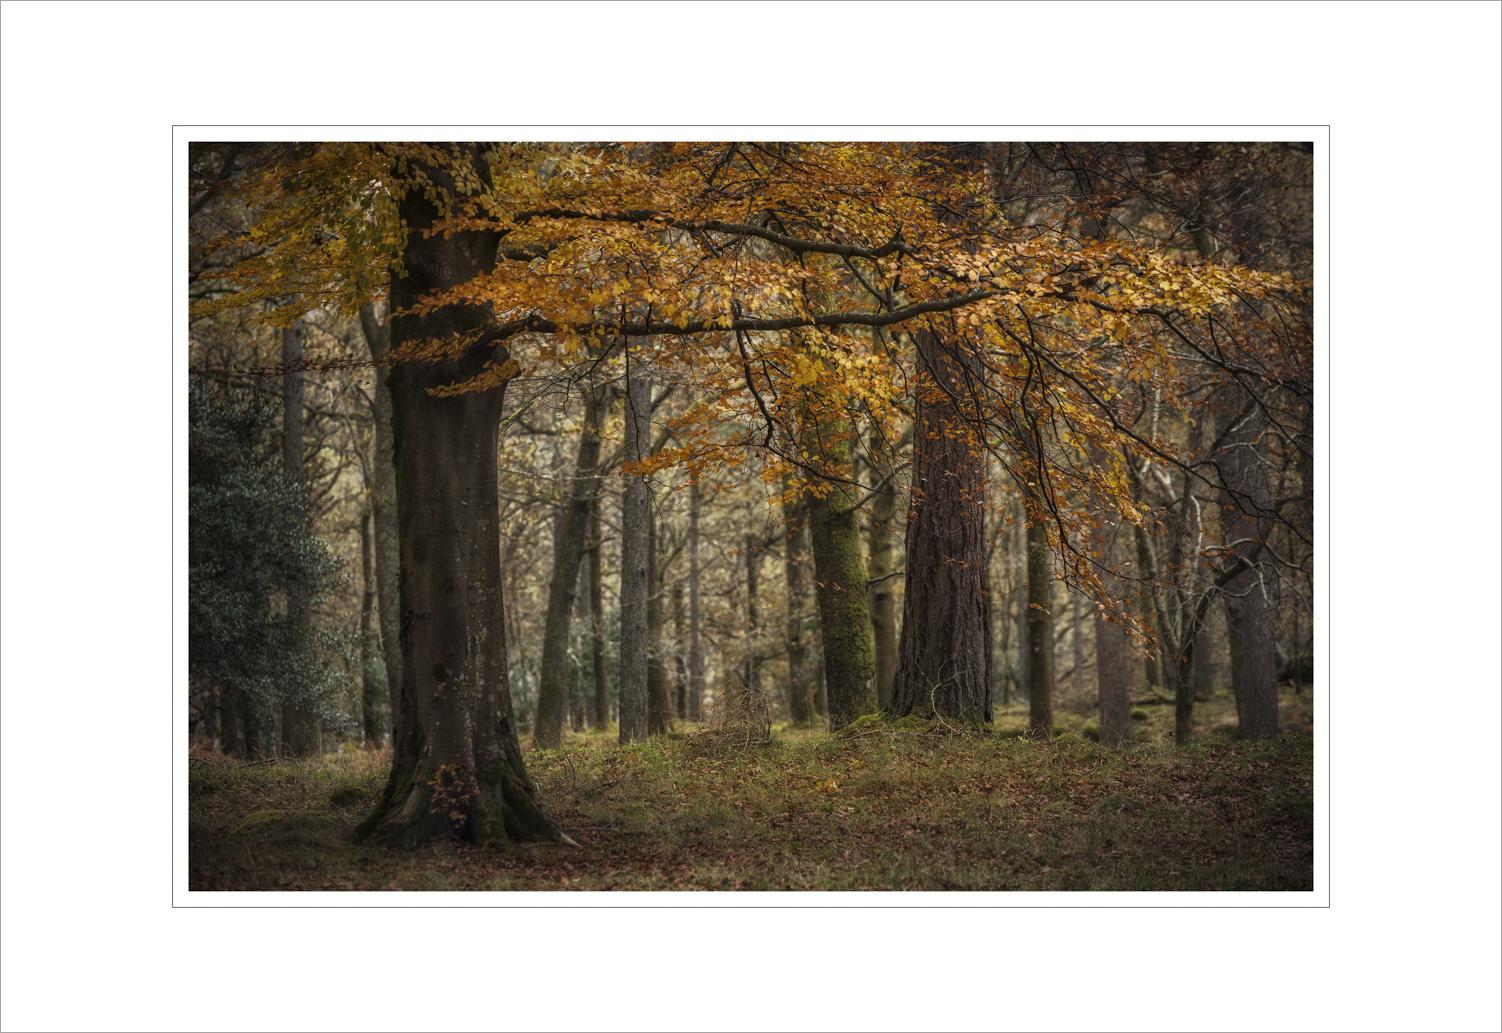 016 Manesty Woods